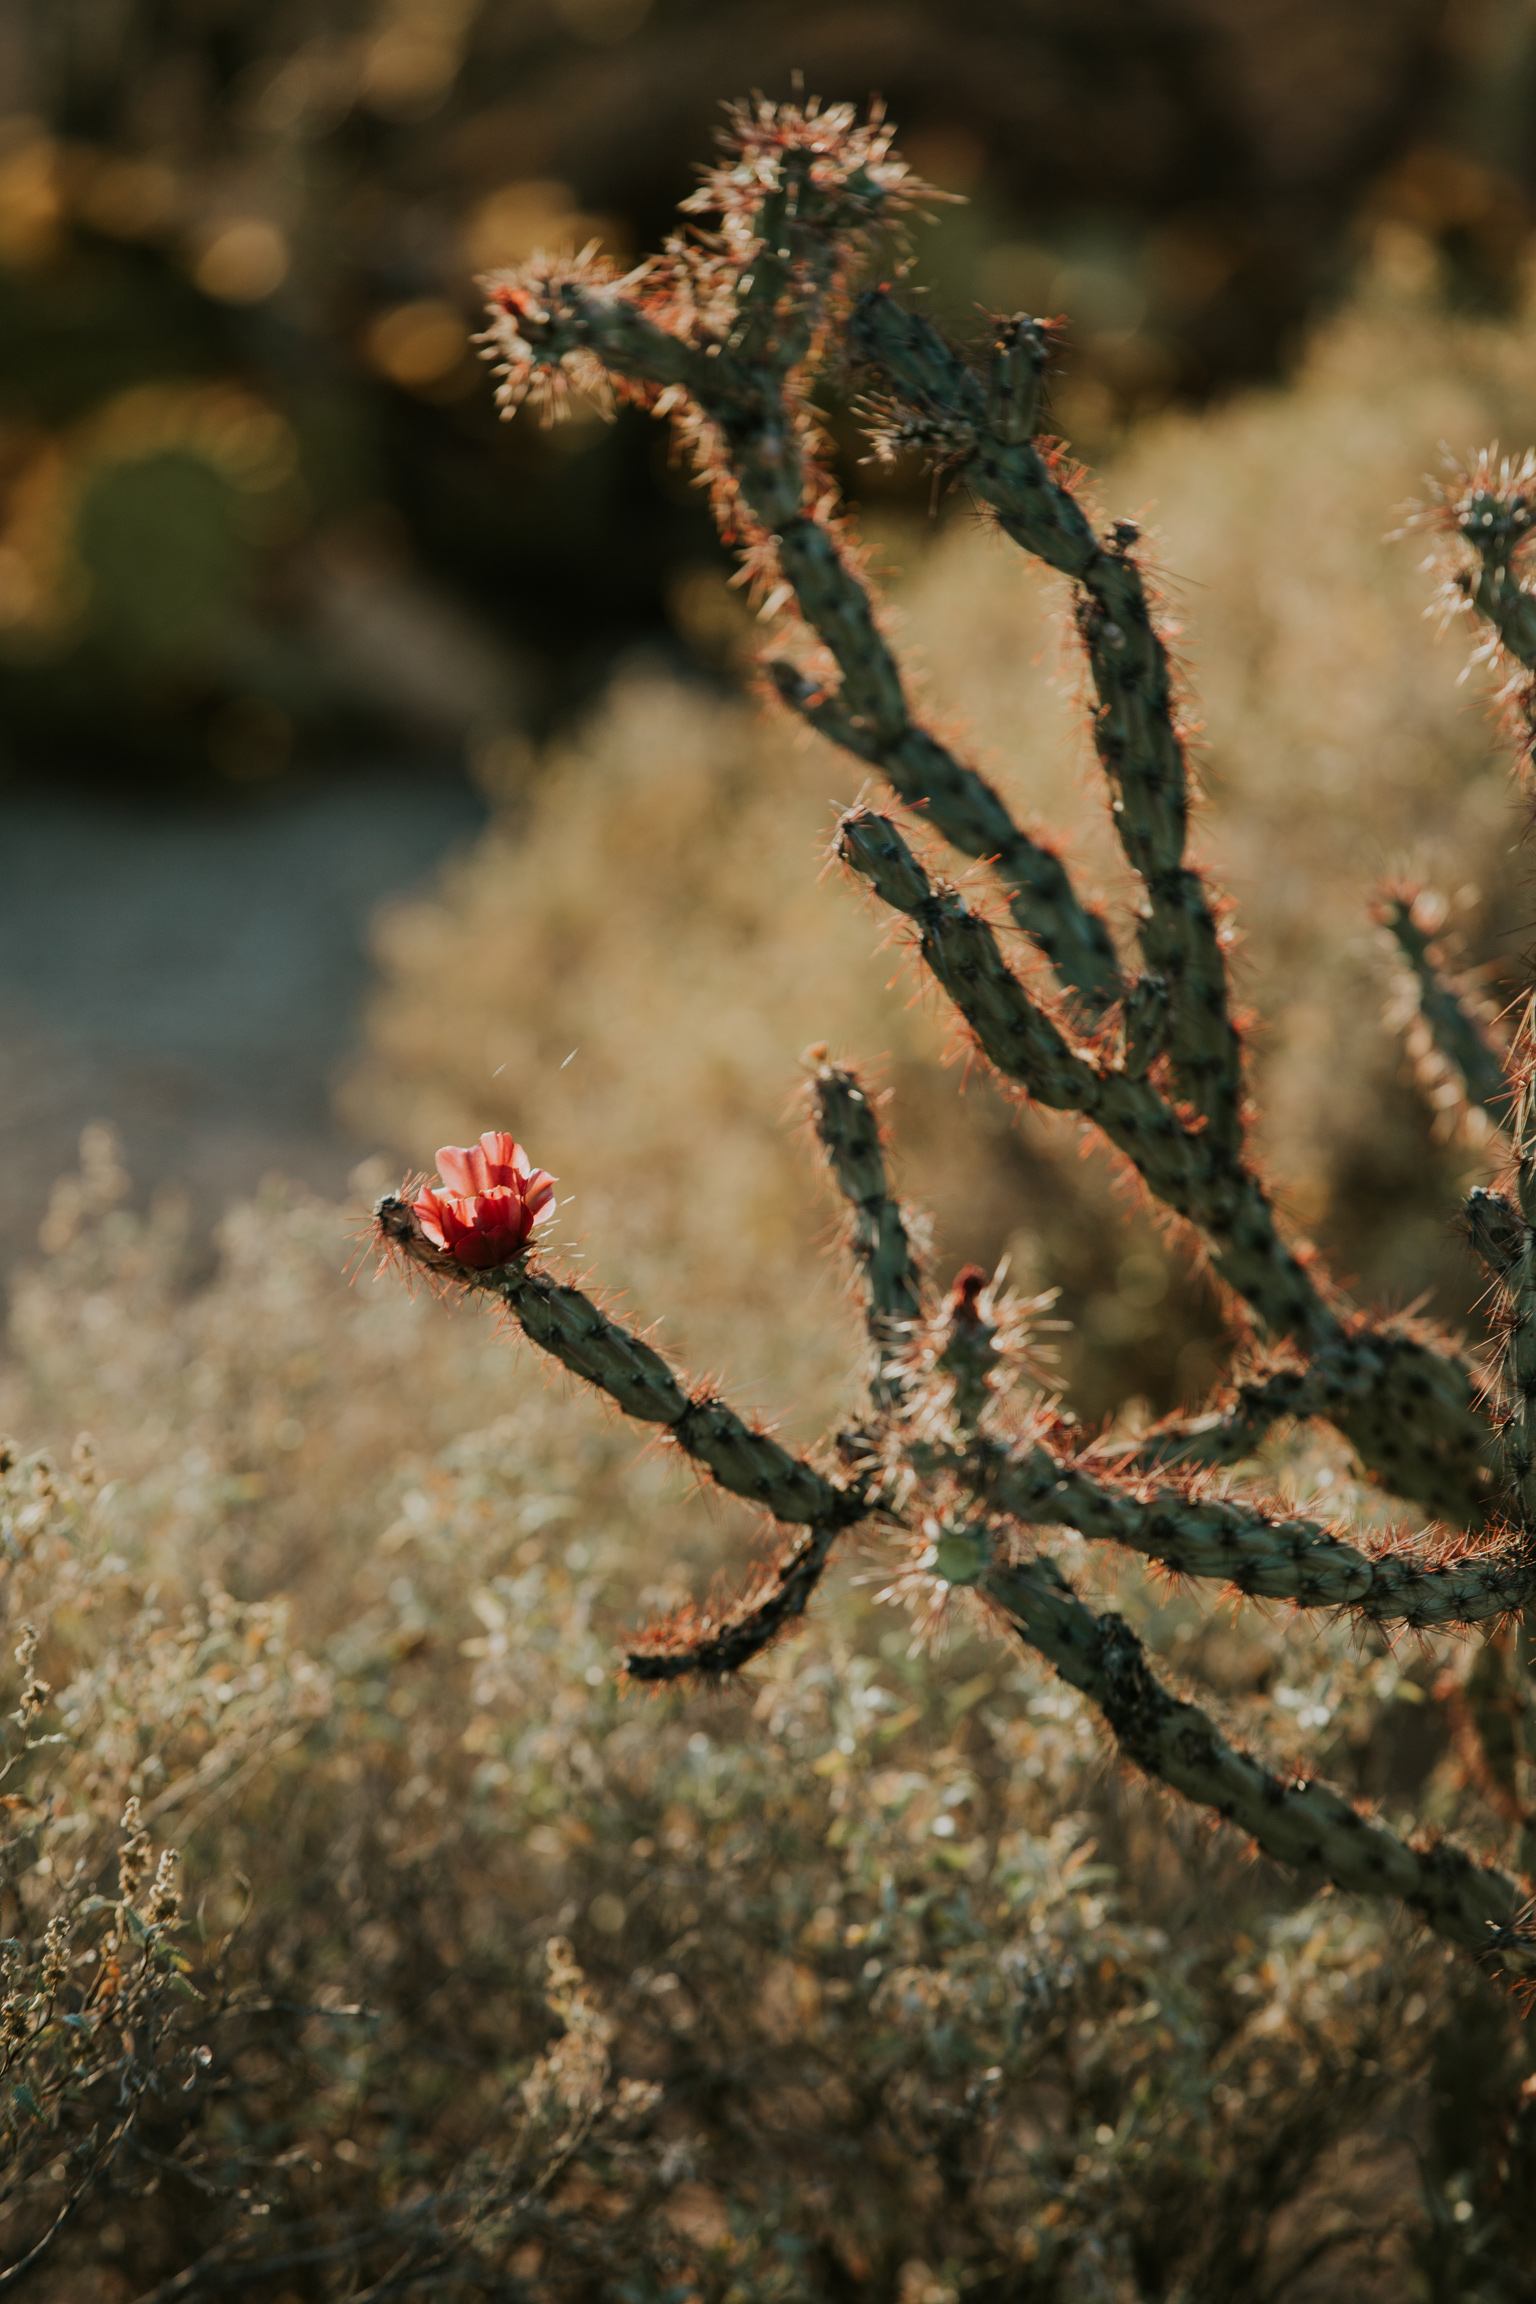 CindyGiovagnoli_Tucson_Arizona_Saguaro_National_Park_cactus_sunset_blooming_spring_sunset_petroglyphs_Native_American_indigenous-004.jpg